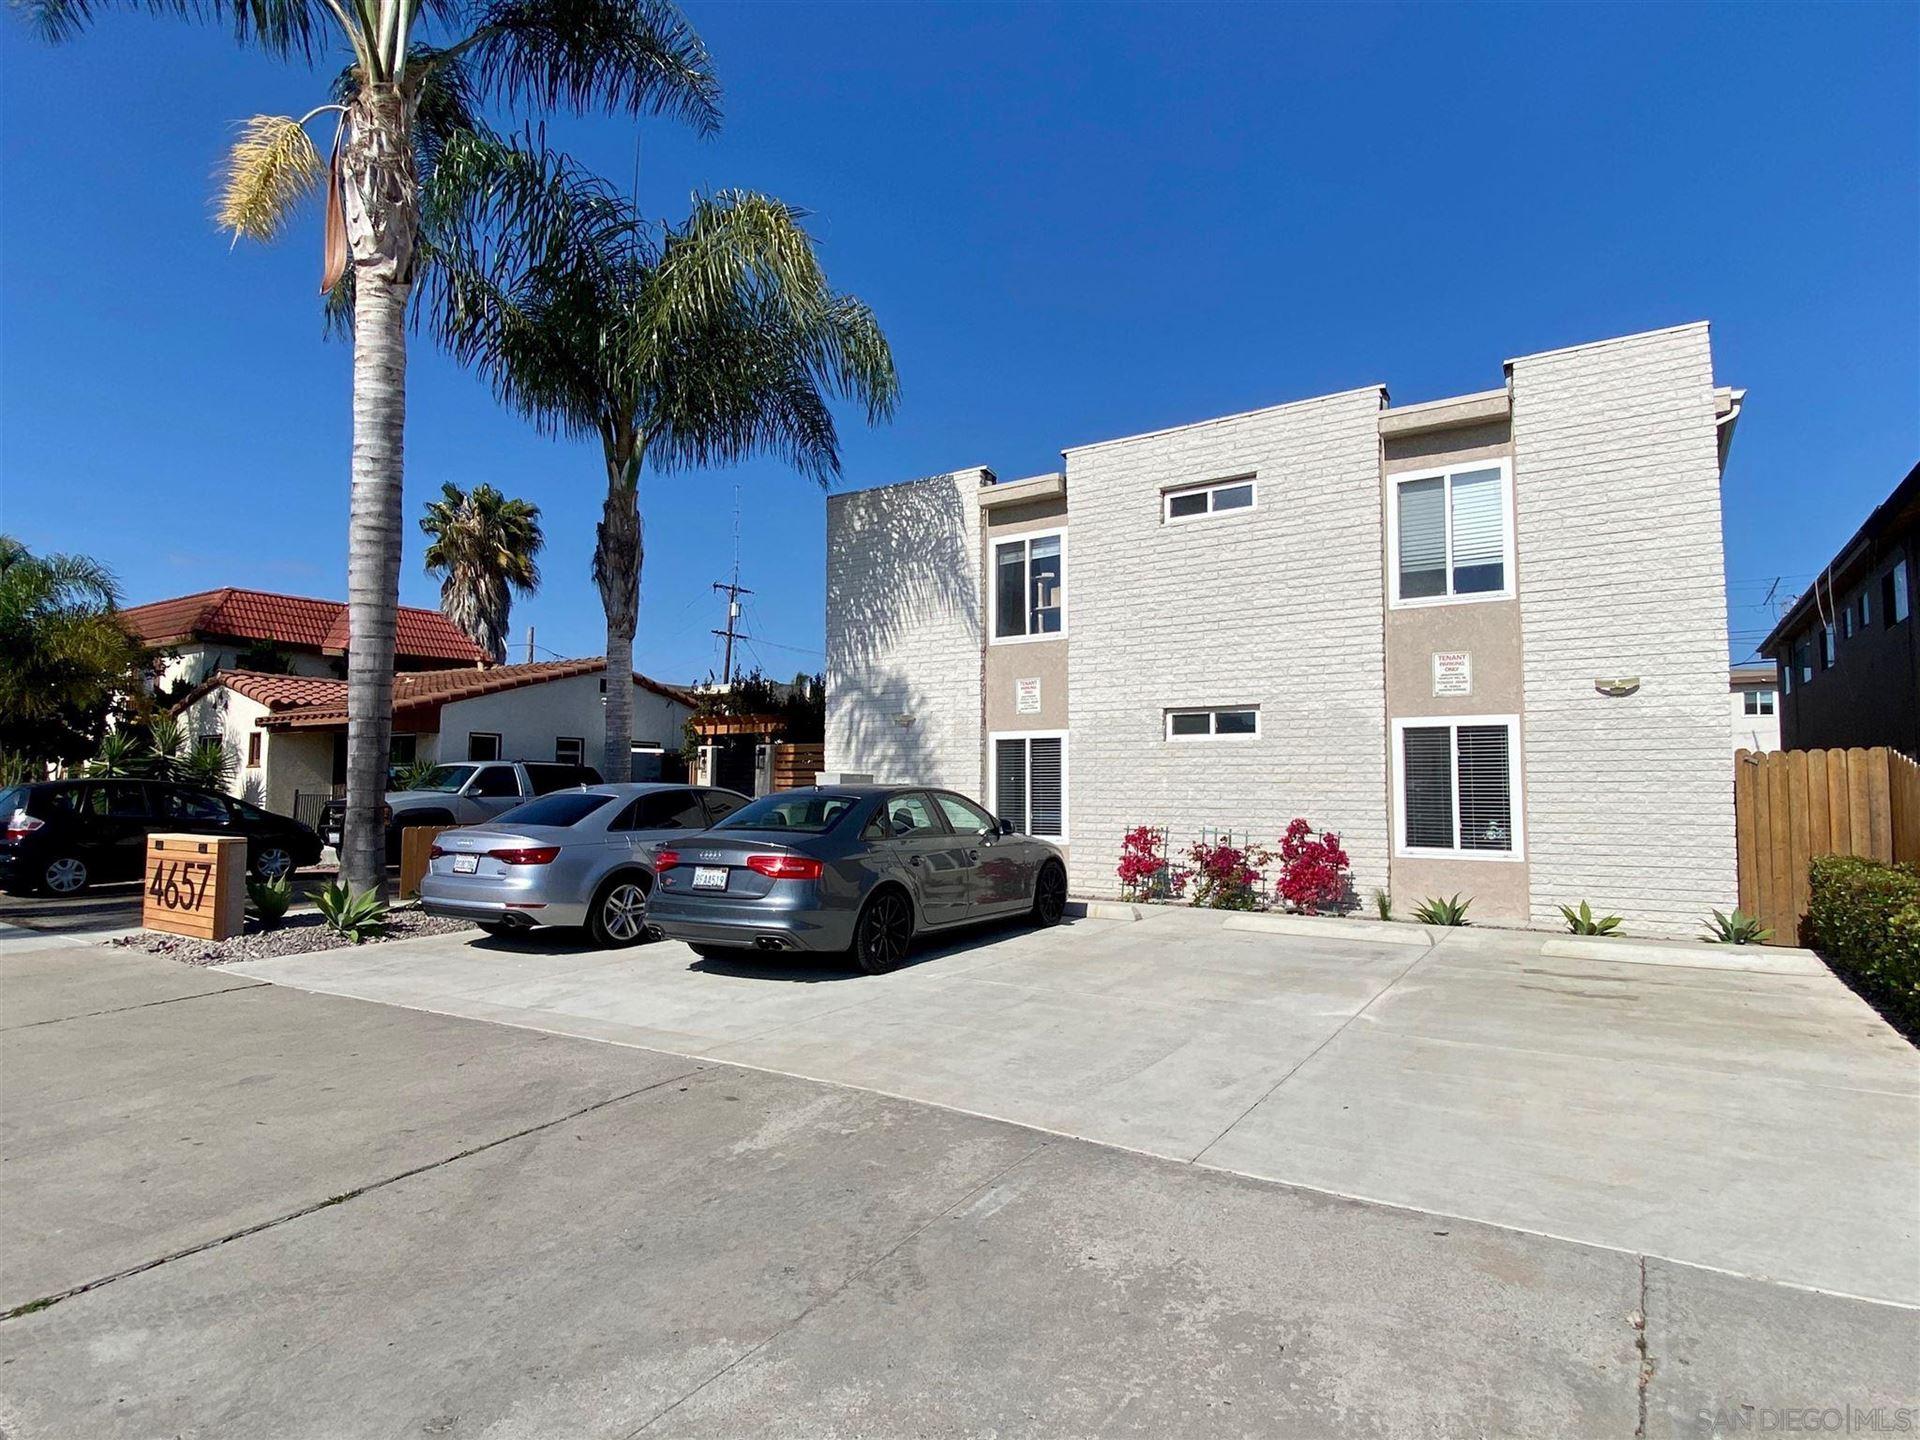 Photo of 4657 32nd, San Diego, CA 92116 (MLS # 210013474)